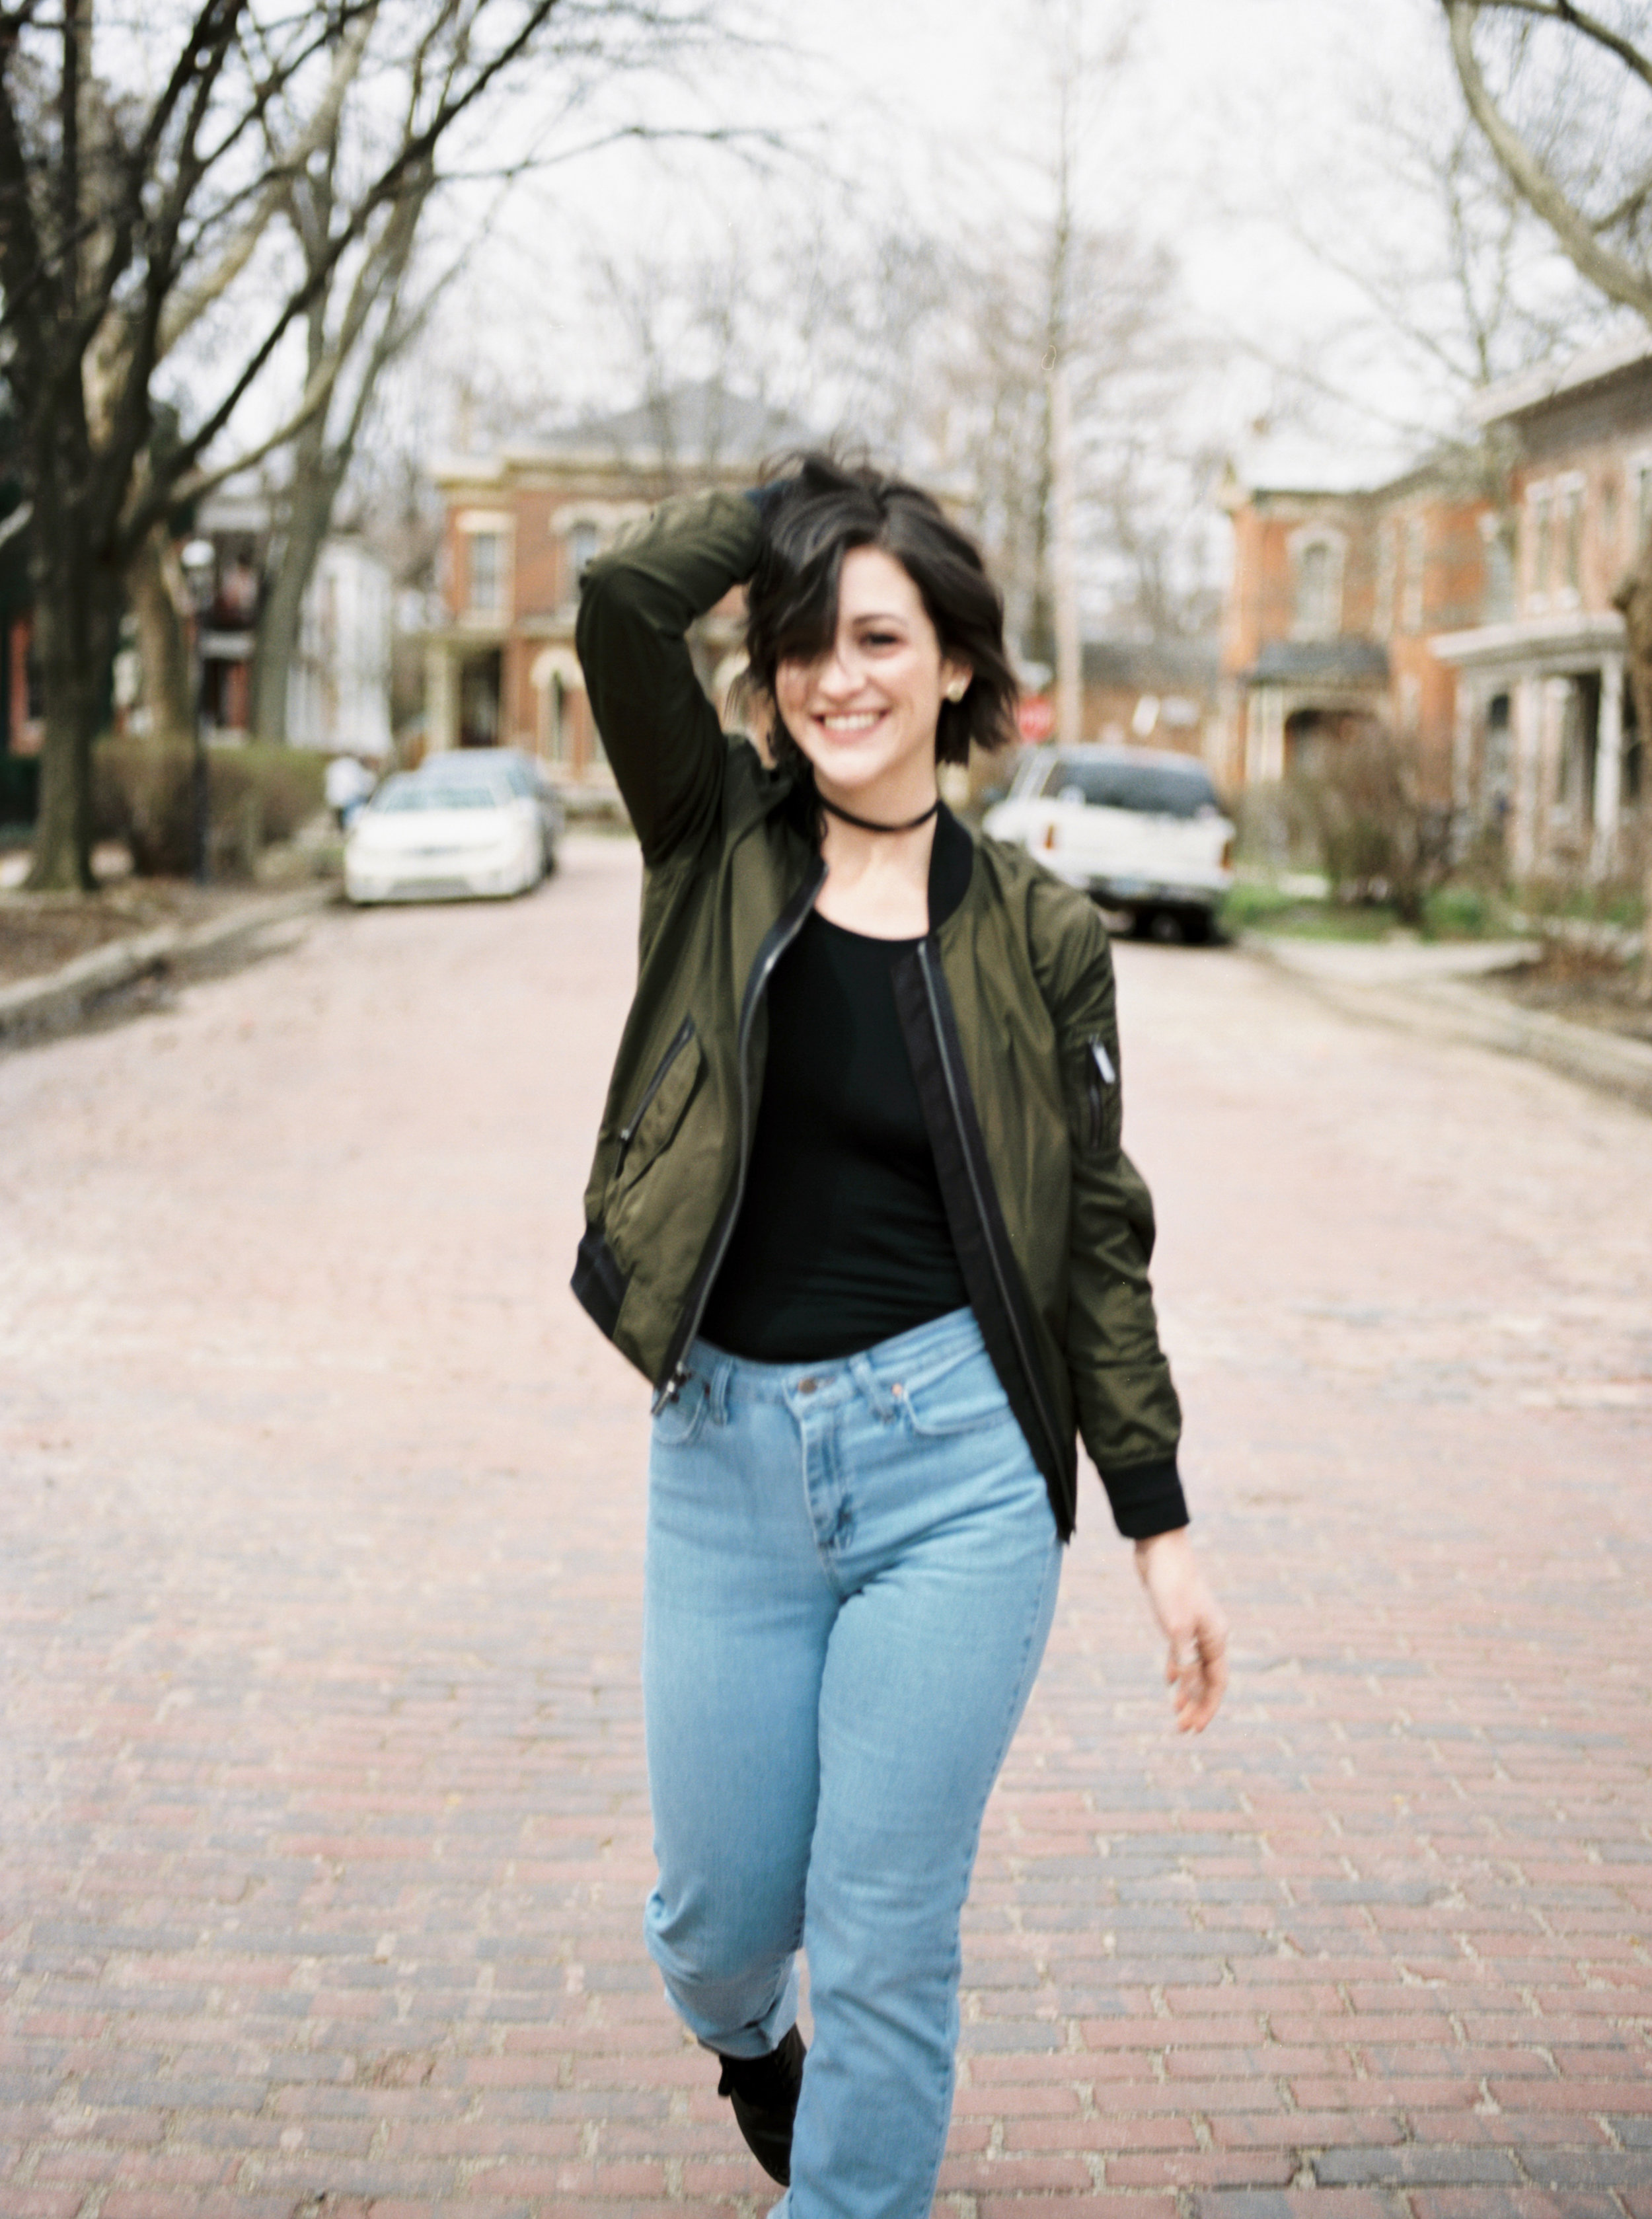 Dayton_Ohio_Cincinnati_Columbus_Cleveland_Film_Portrait_Photographer_Tonya_Espy-9.jpg